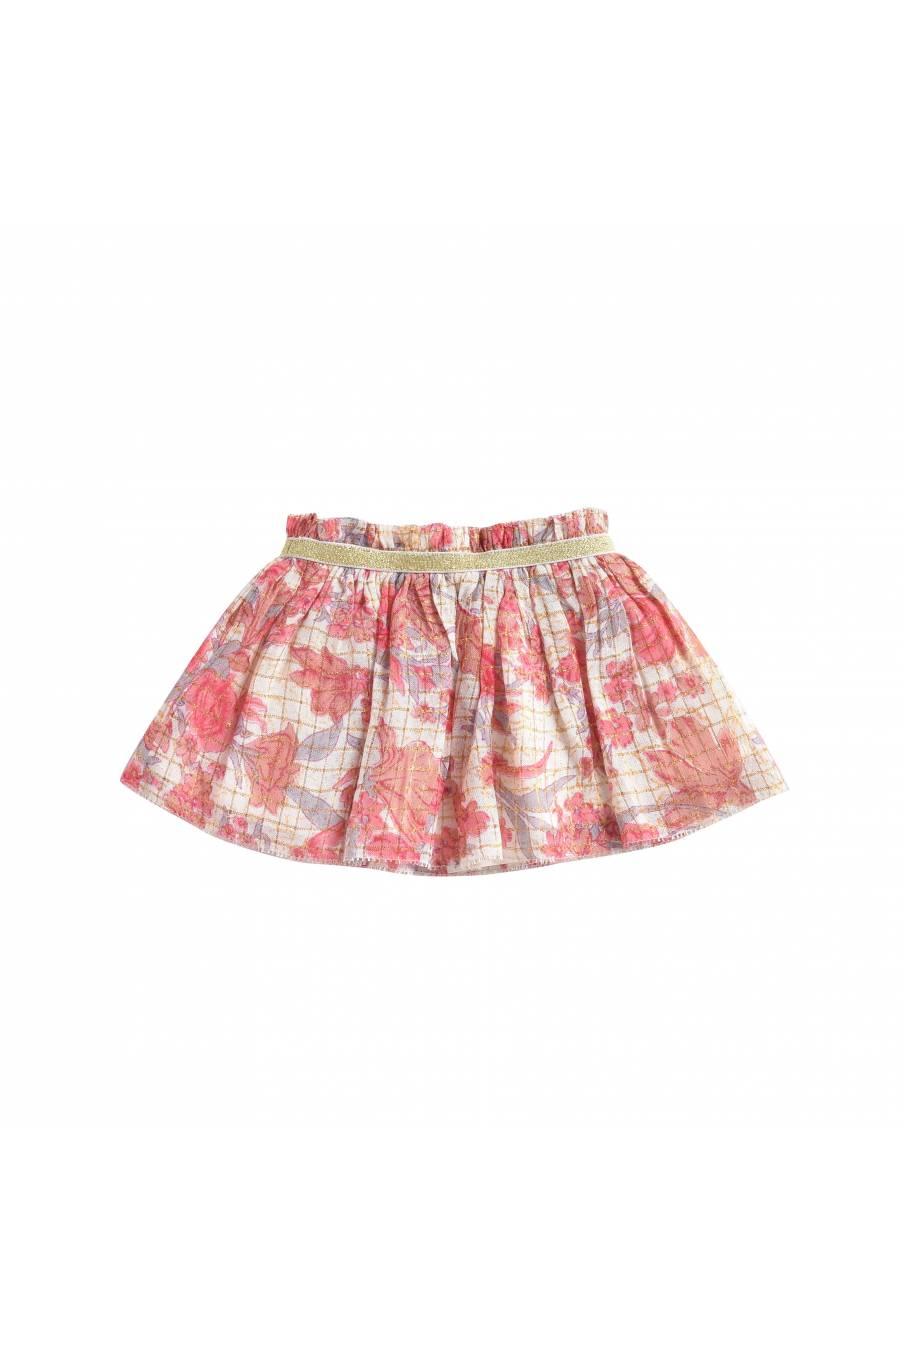 Skirt Salina Pink Flowers